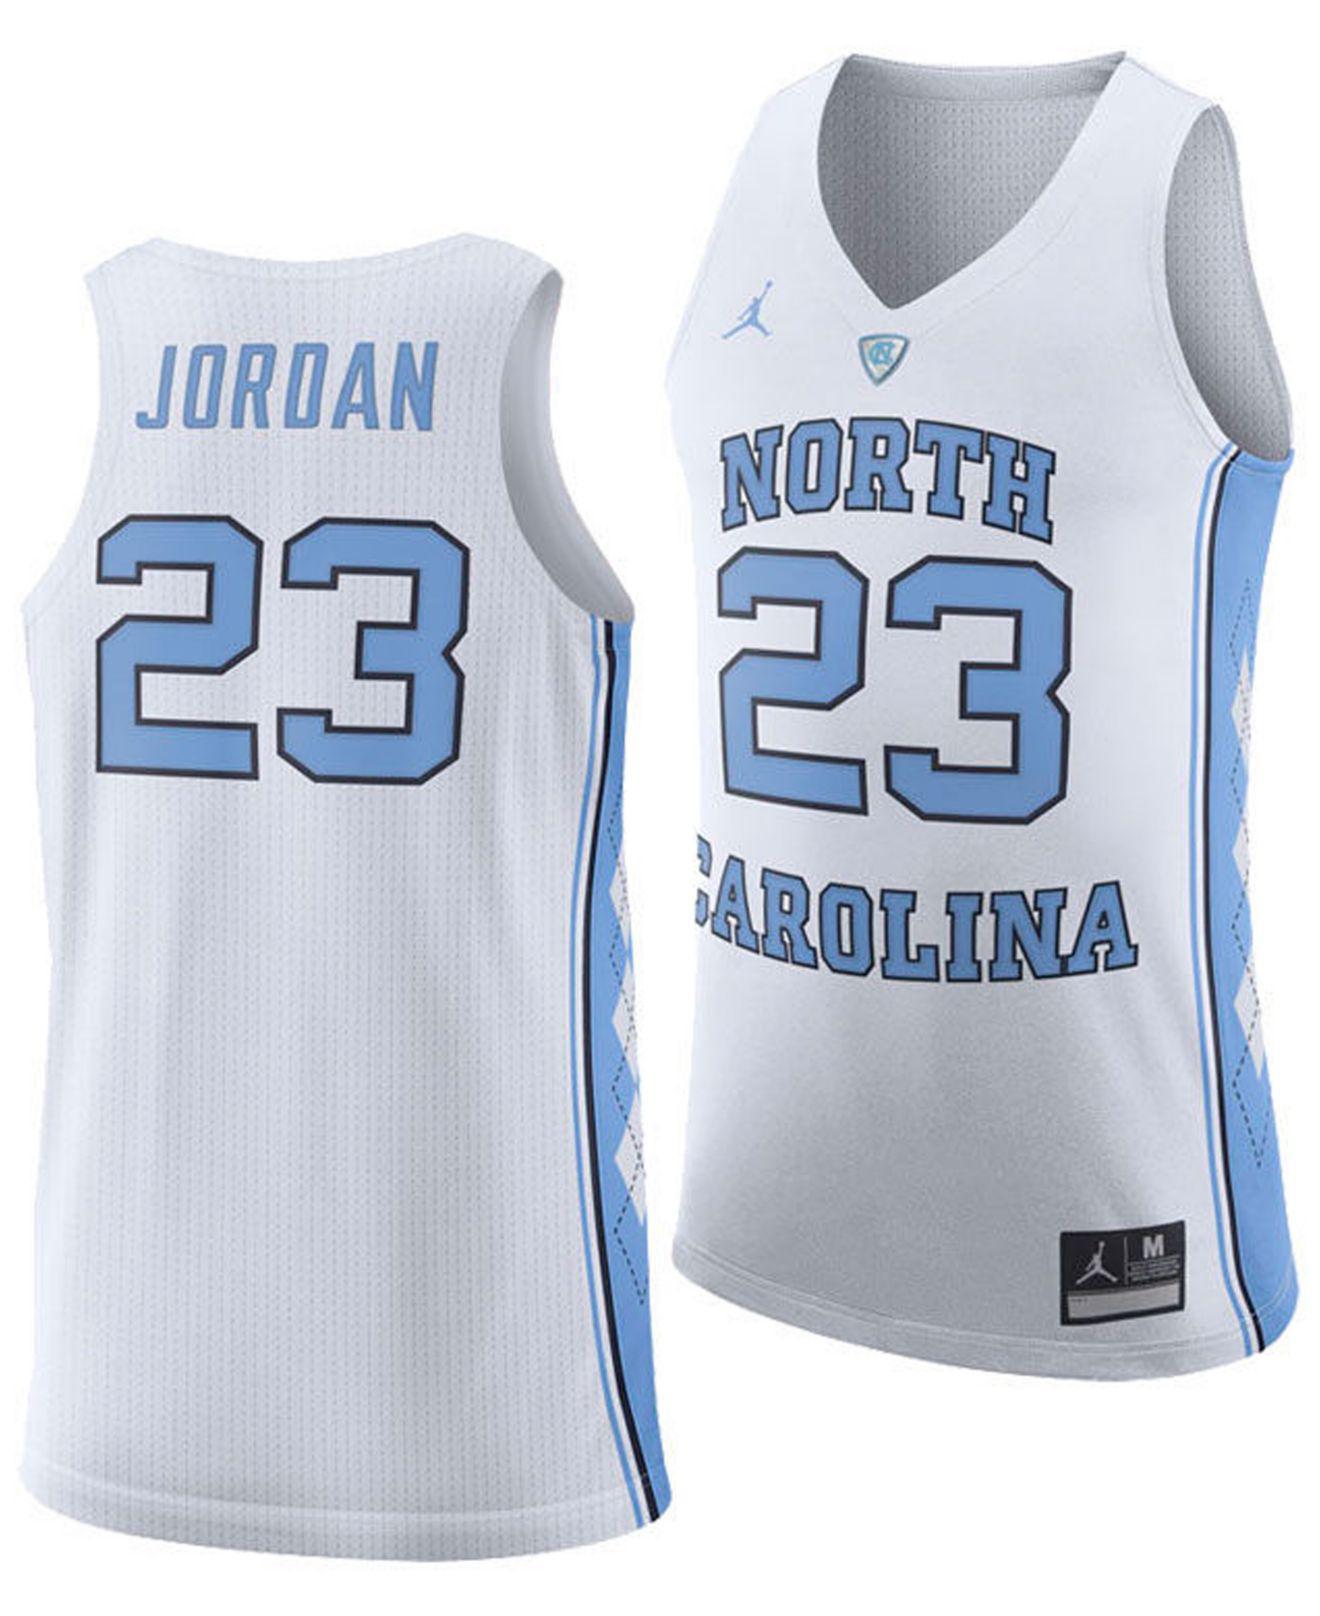 77440c77a07 Nike. Men's White Michael Jordan North Carolina Tar Heels Authentic  Basketball Jersey